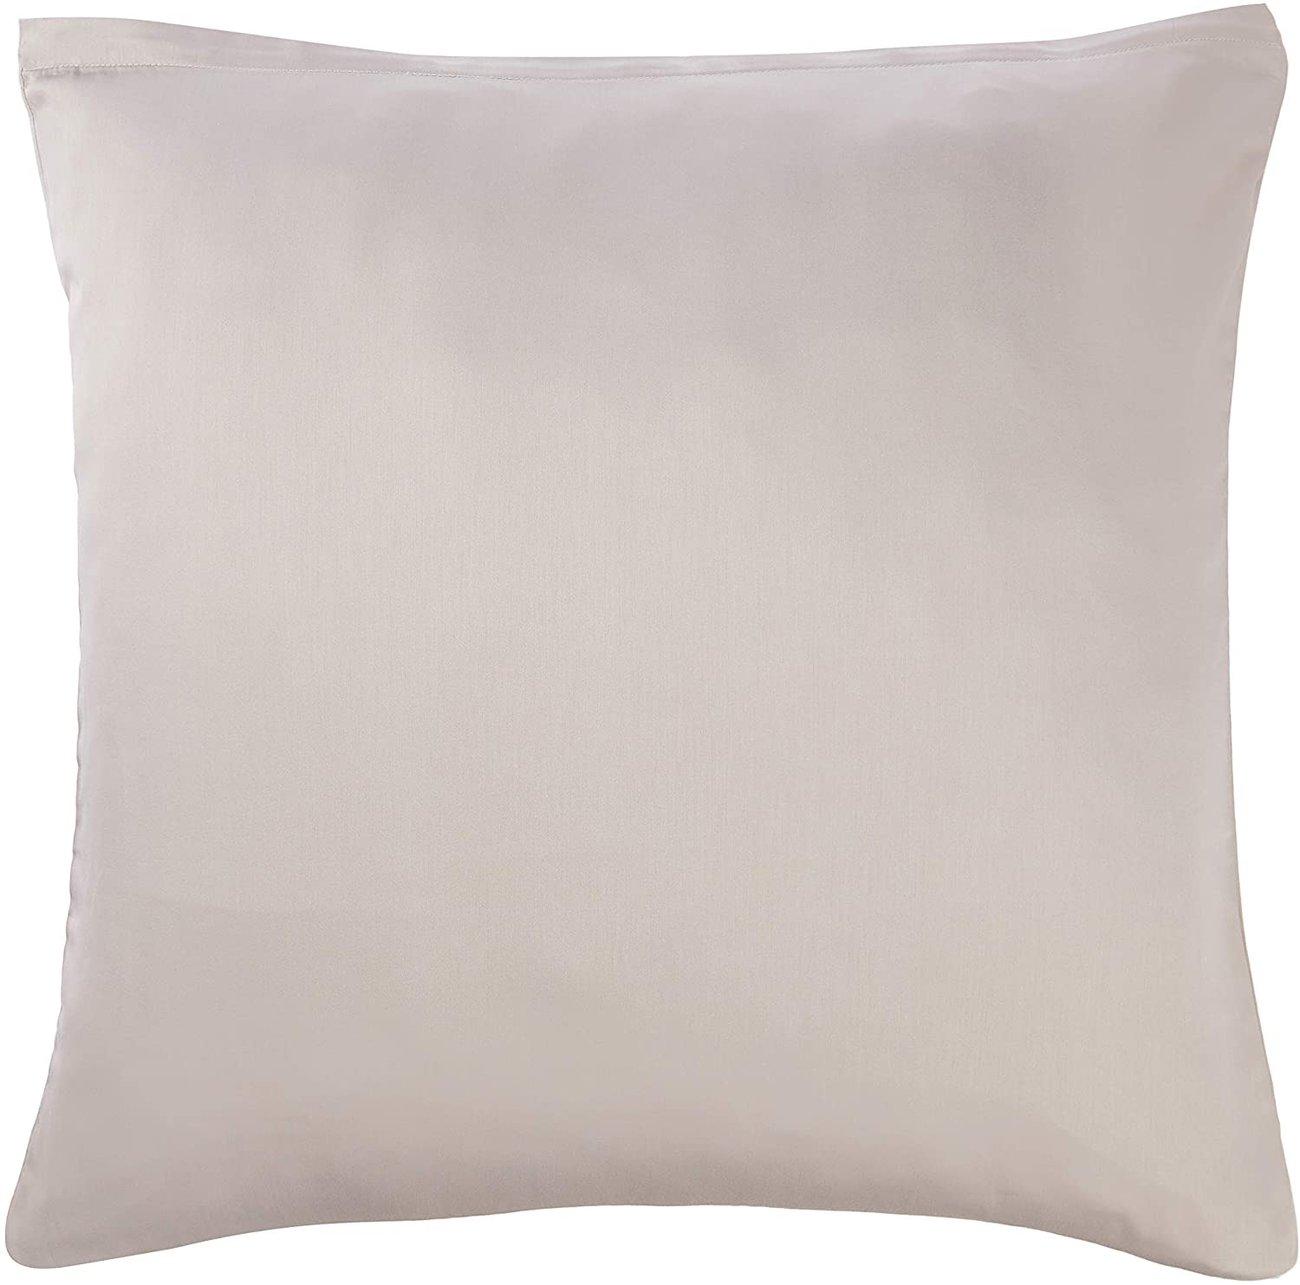 Спален комплект Sateen Duvet Cover Set 887719087429 бельо за спалня 3 части